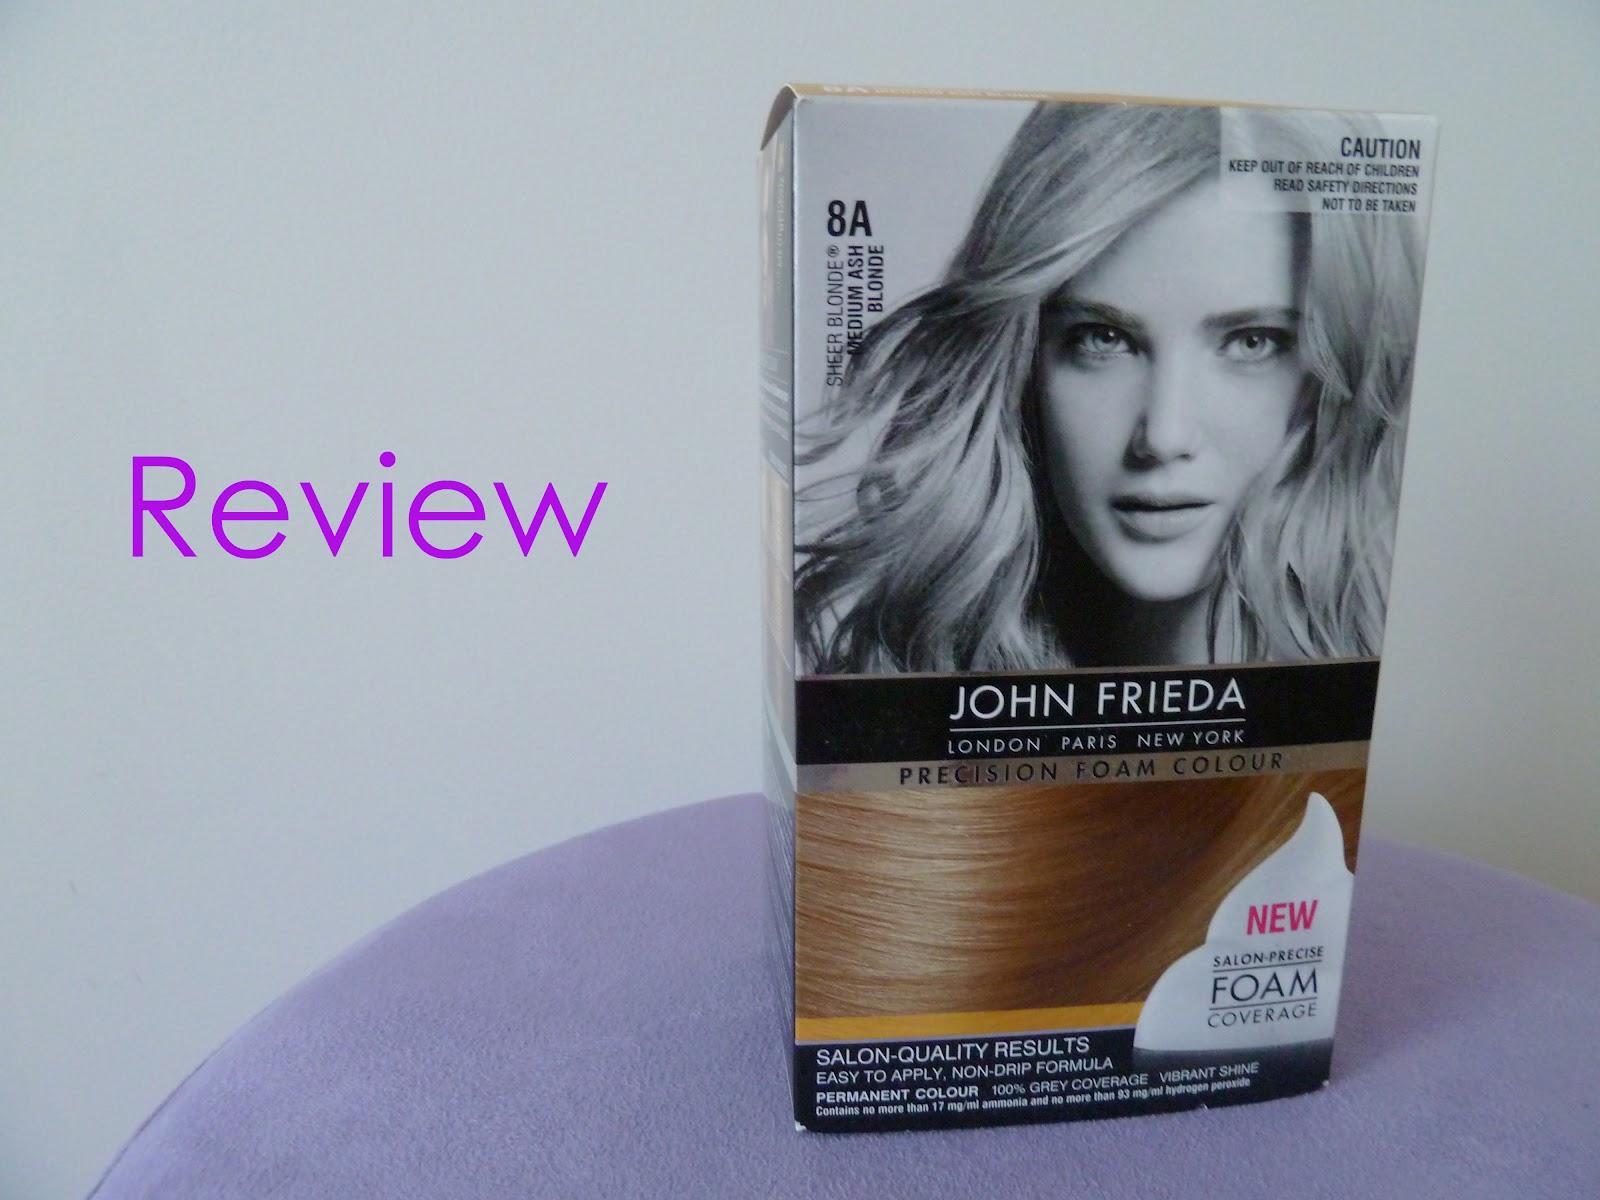 Australian Beauty Review John Frieda Precision Foam Colour